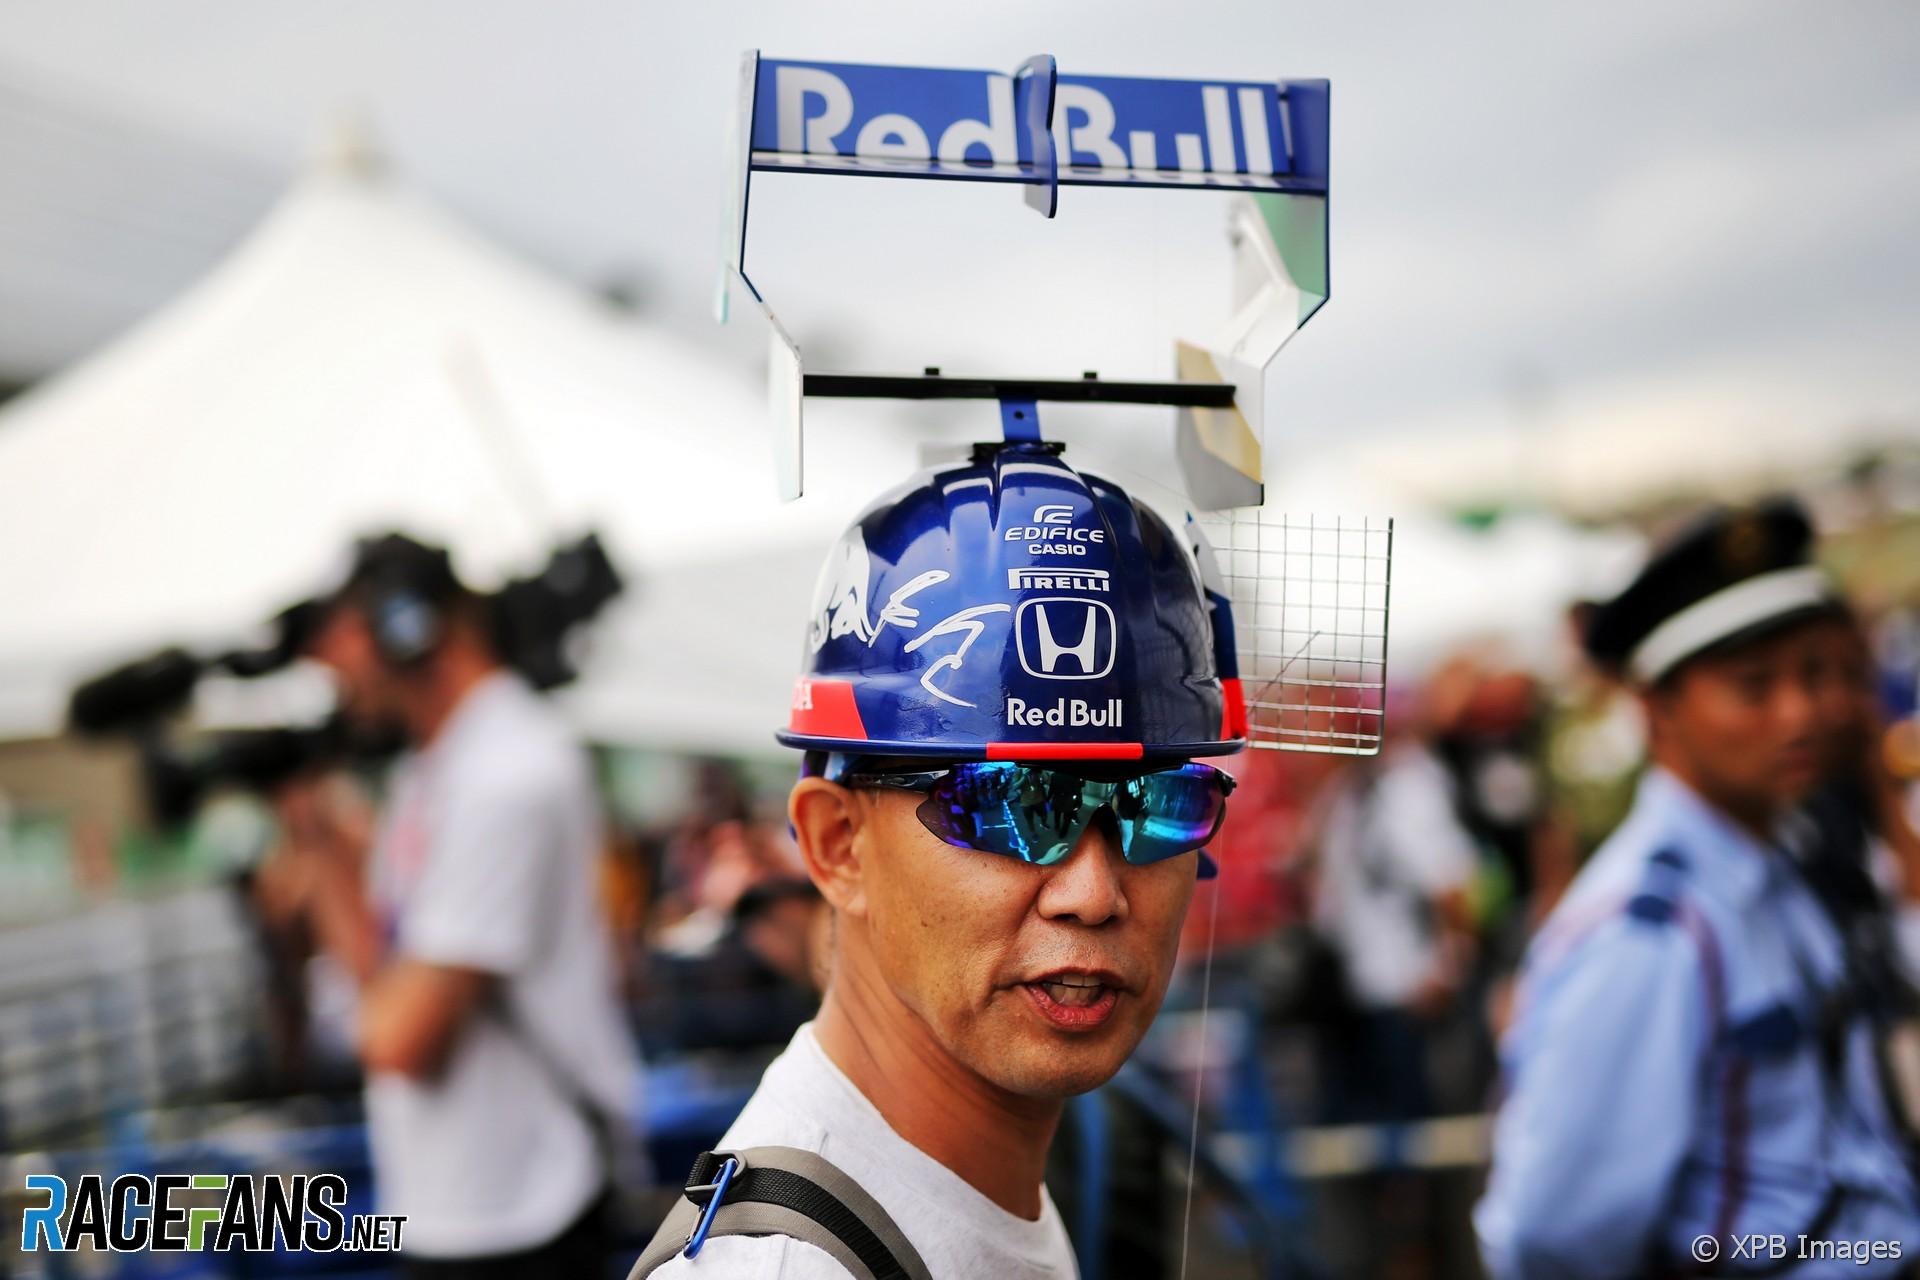 Toro Rosso fan, Suzuka, 2019